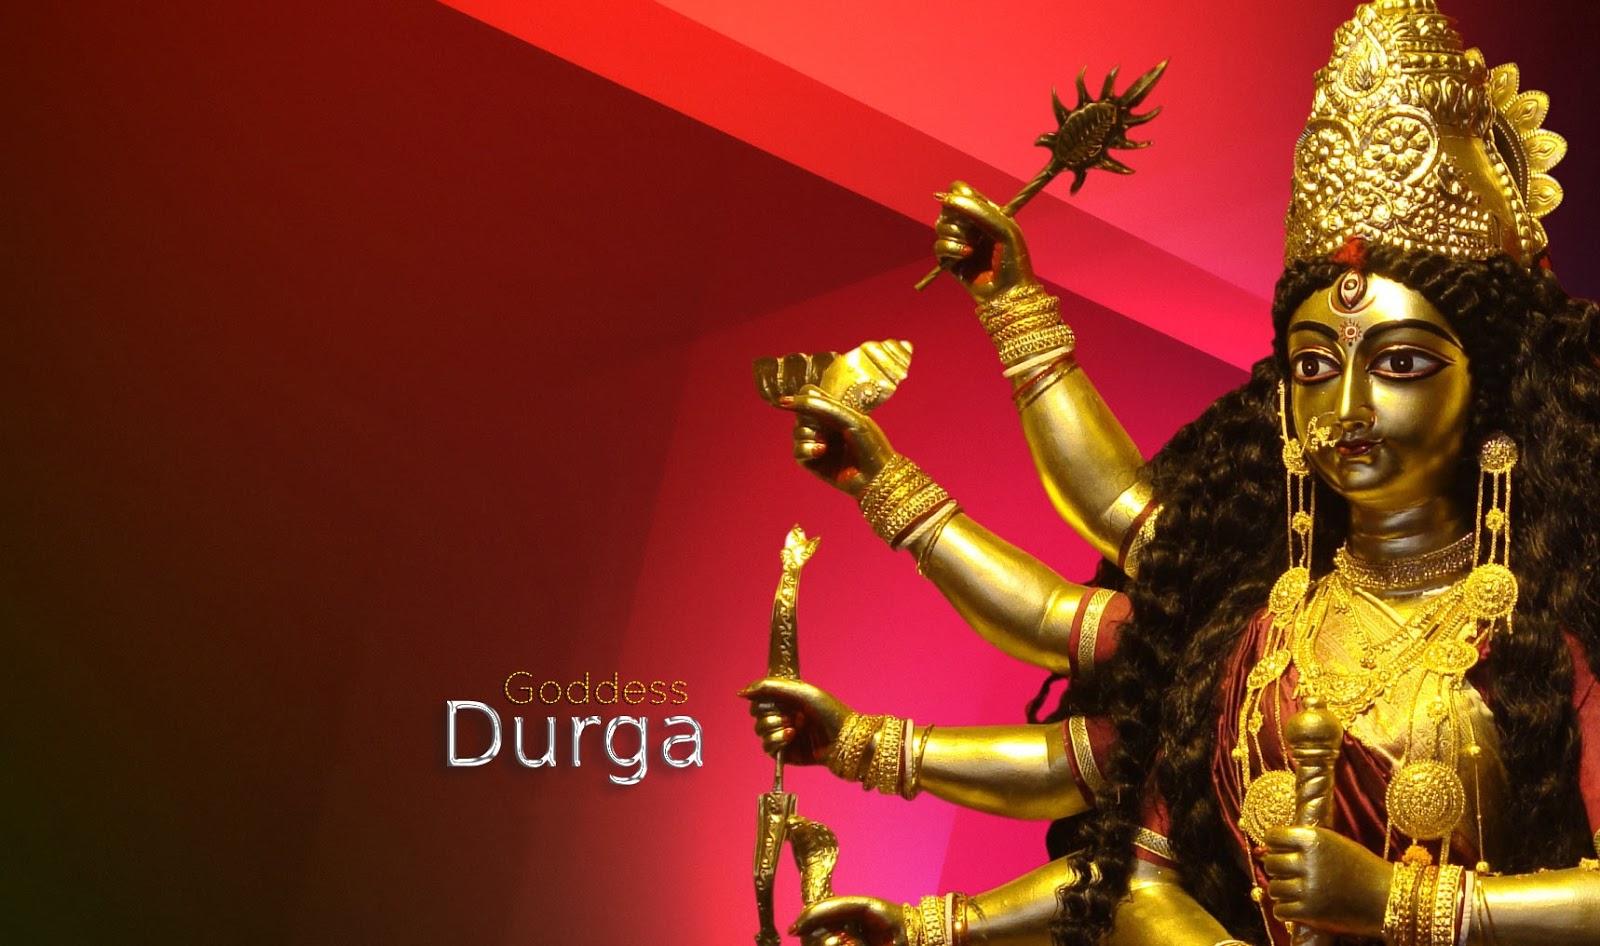 essay on durgapuja in hindi Advertisements: दुर्गा पूजा पर निबन्ध | essay on durga puja in hindi 1 भूमिका: दुर्गा शक्ति.